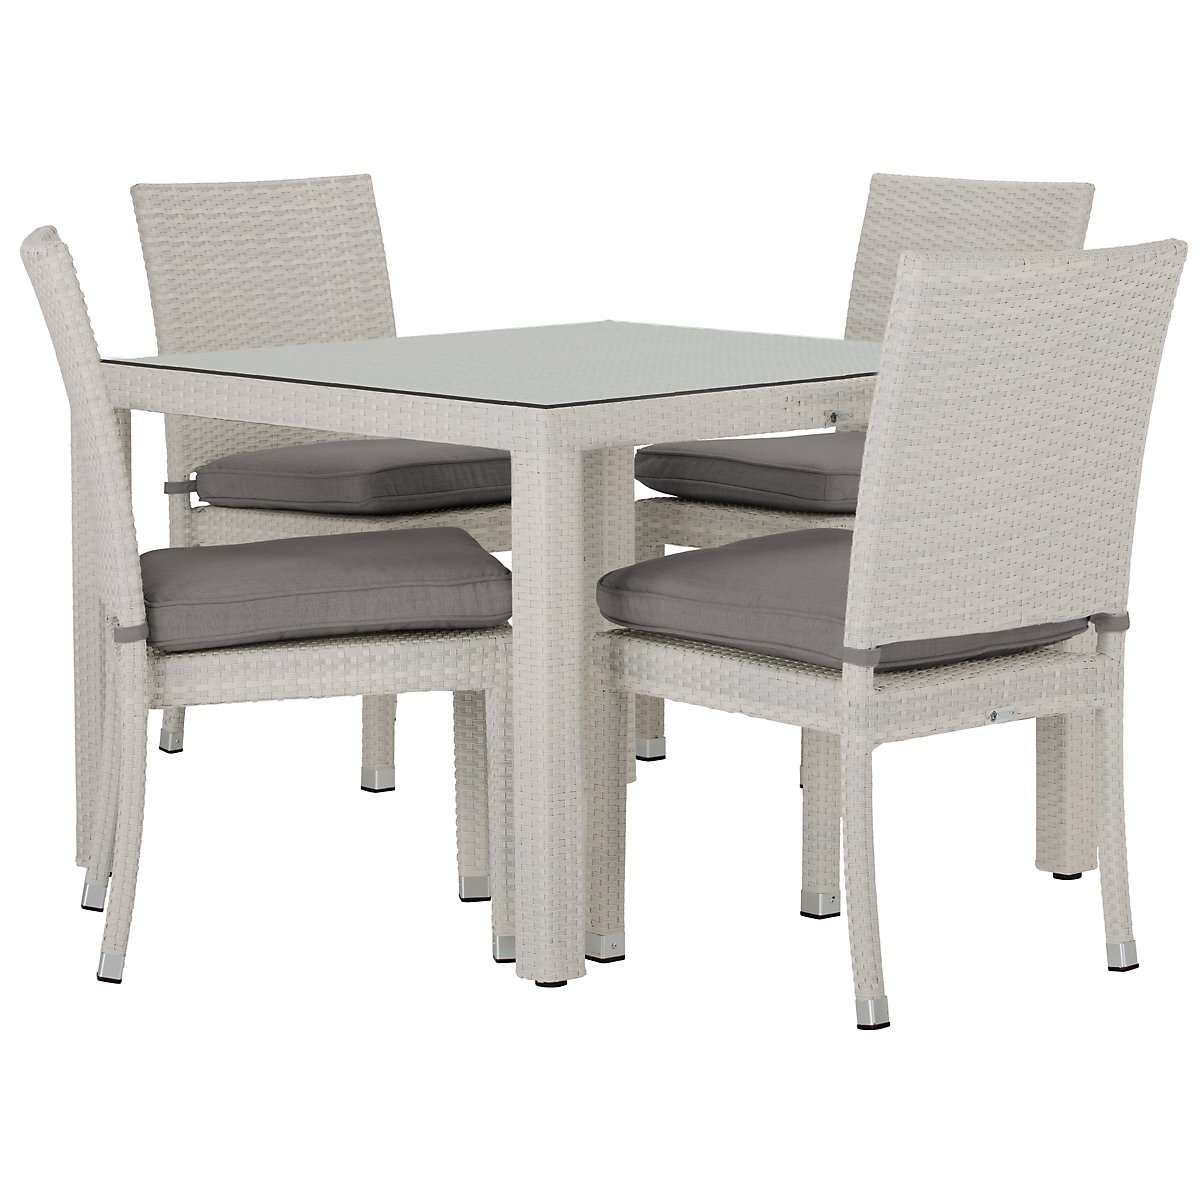 City furniture bahia gray 40 square table 4 chairs bahia gray 40 square table 4 chairs watchthetrailerfo